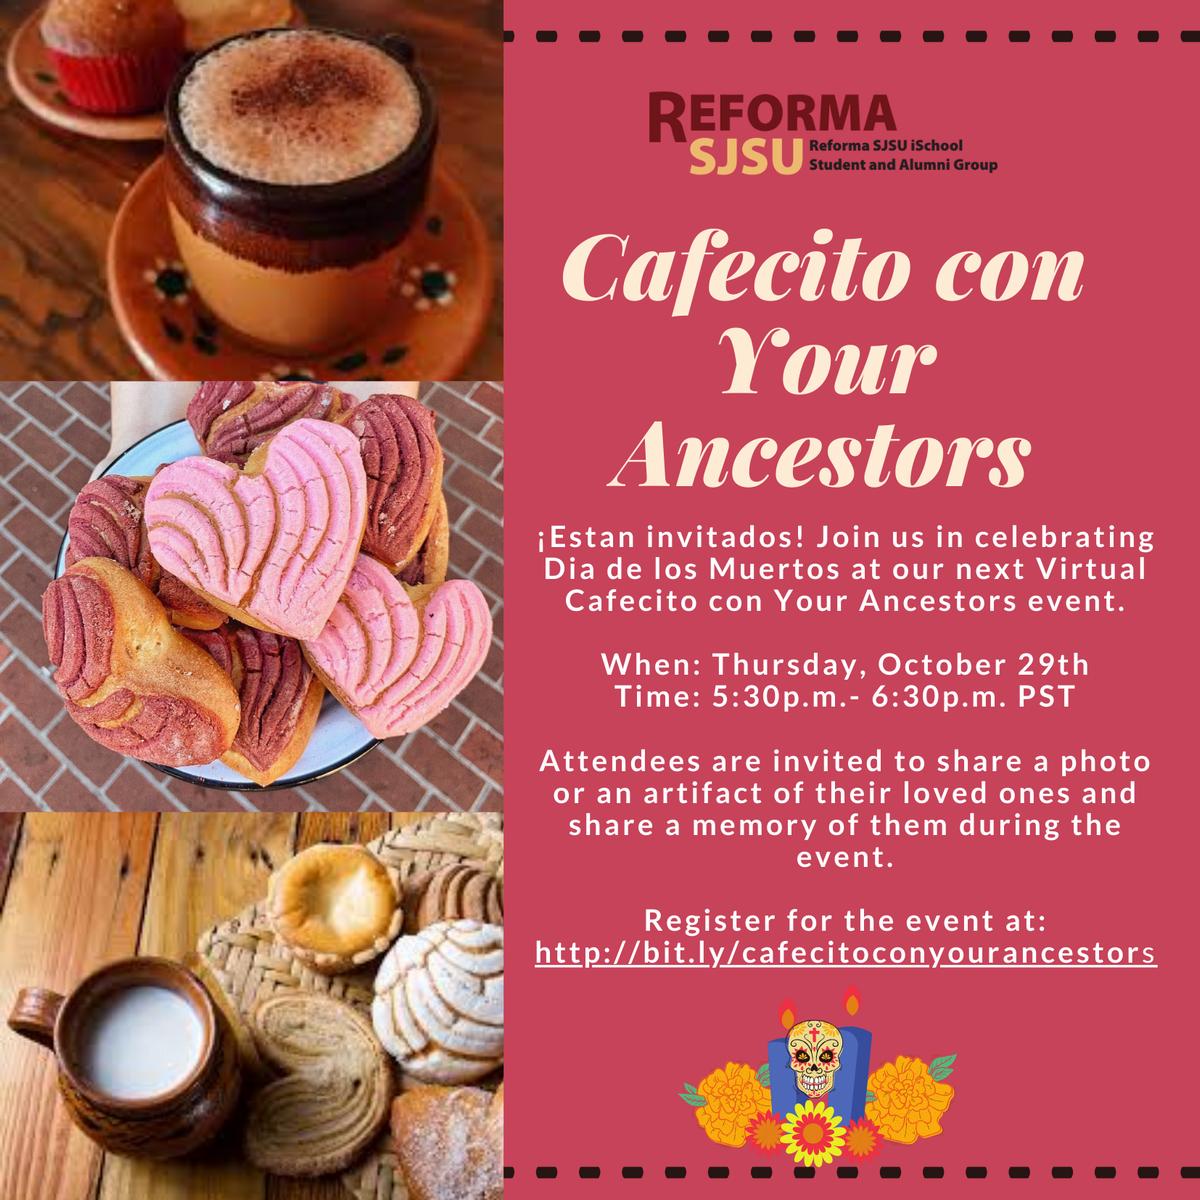 Cafecito con Your Ancestors promotional graphic